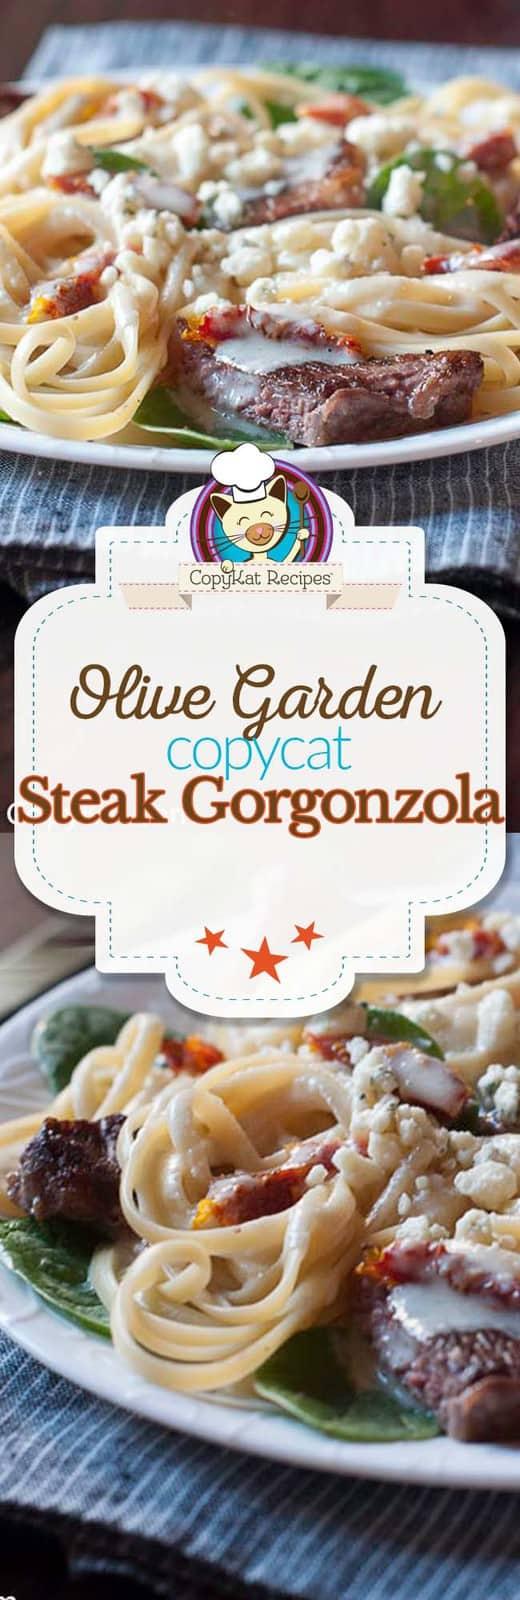 Make the Olive Garden Steak Gorgonzola Alfredo.  You will love this copycat recipe. #copycat #copycatrecipe #olivegarden #steak #gorgonzola #dinnerrecipe